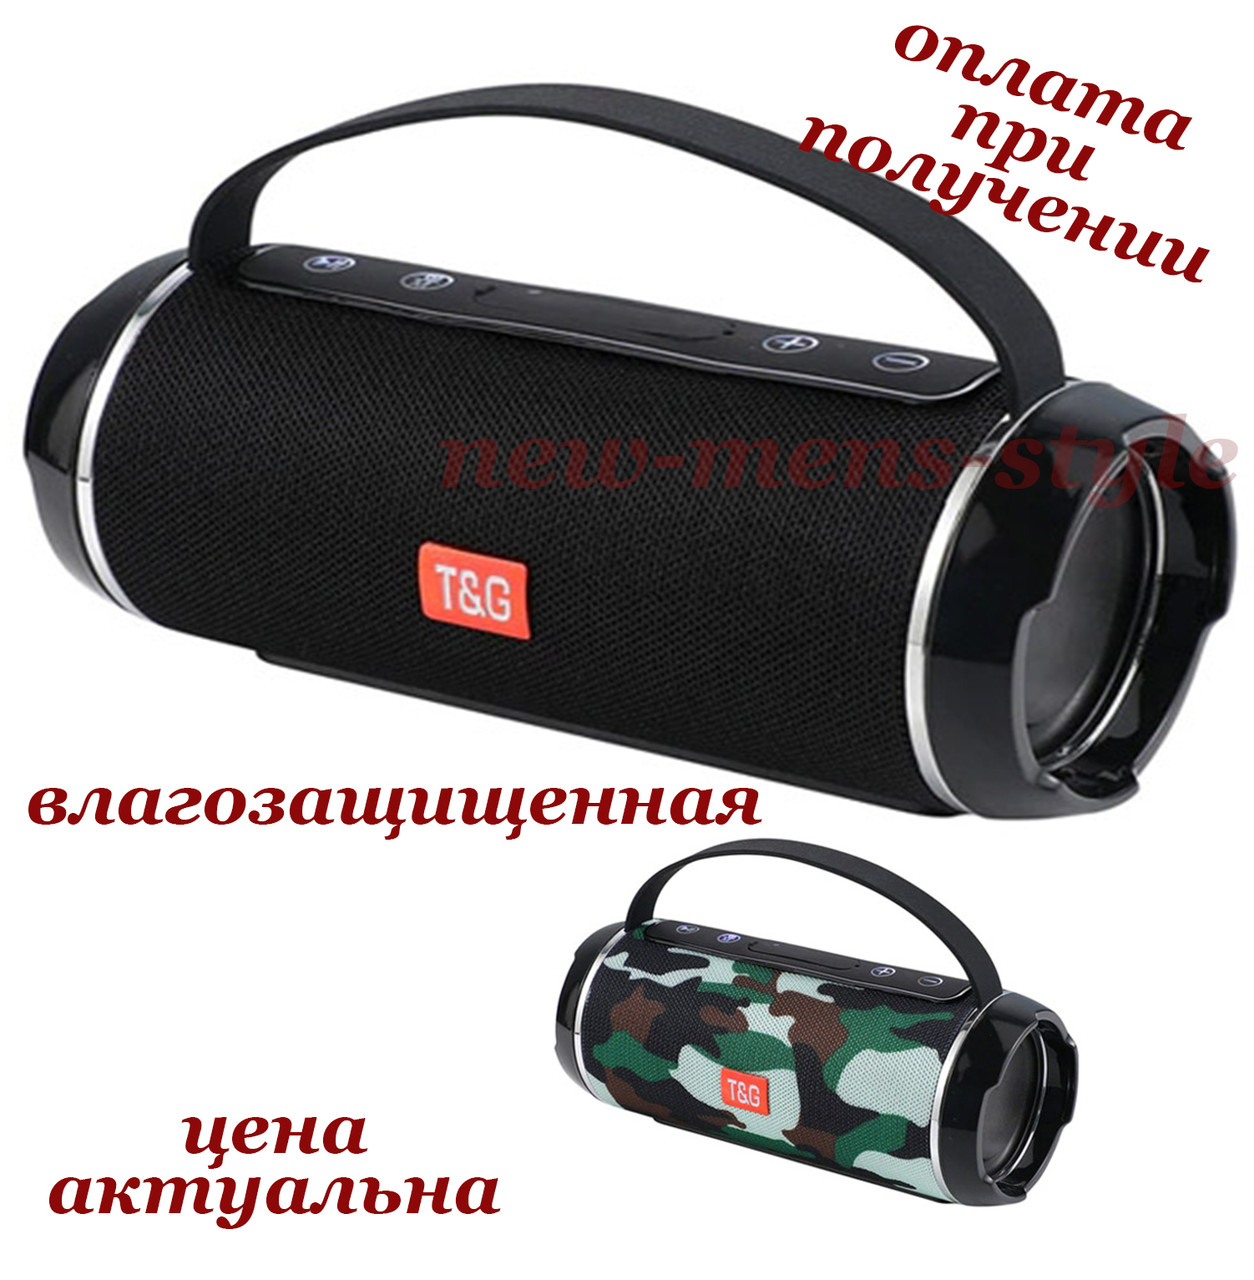 Бездротова мобільна портативна вологозахищена Bluetooth колонка радіо акустика SPS UBL TG116C TG 116C